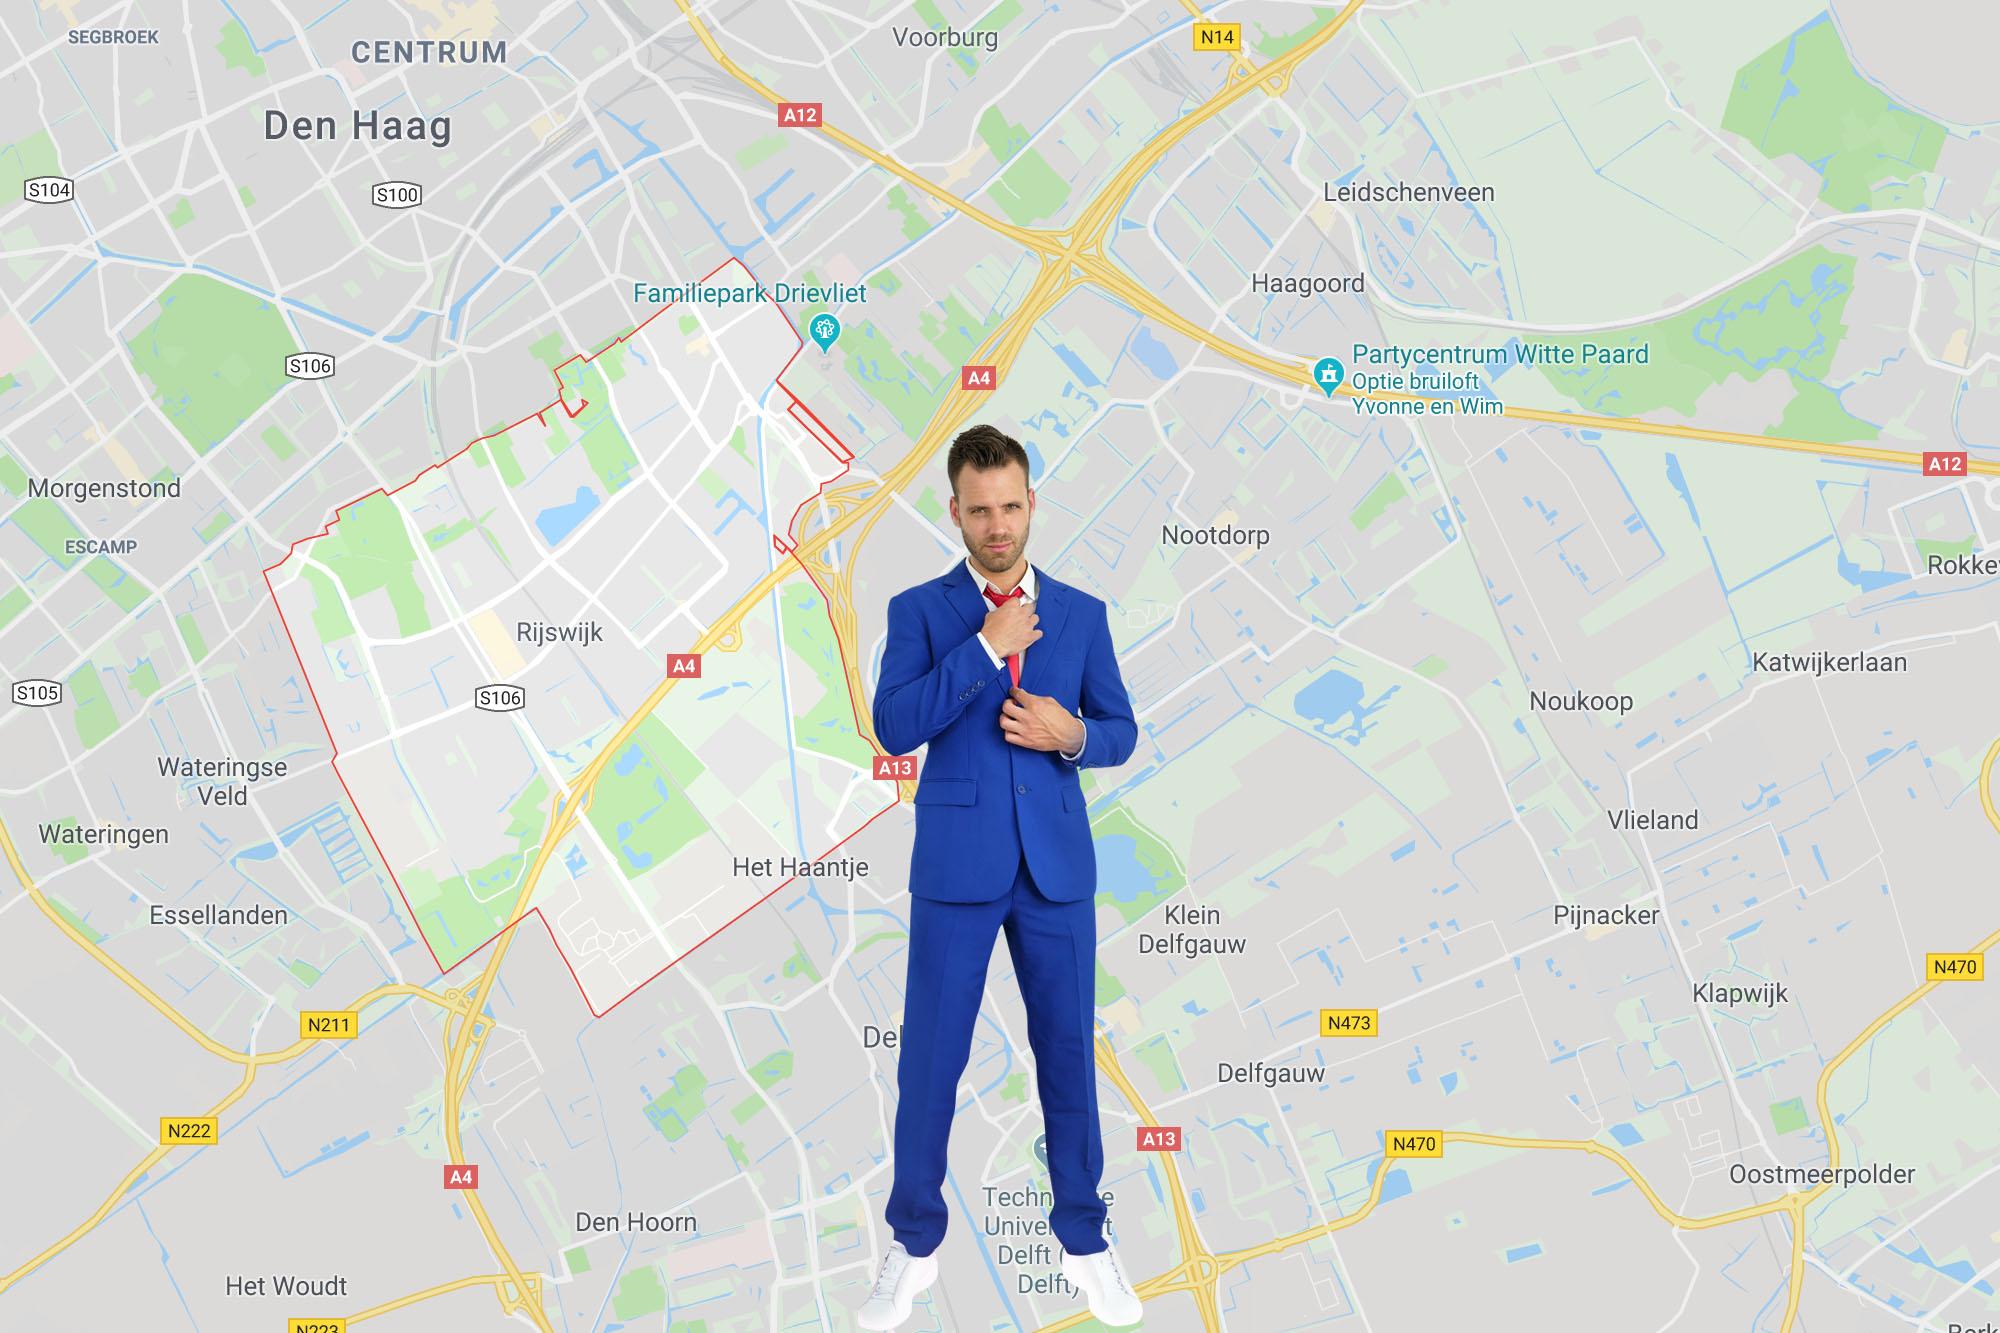 rijswijk zanger dj